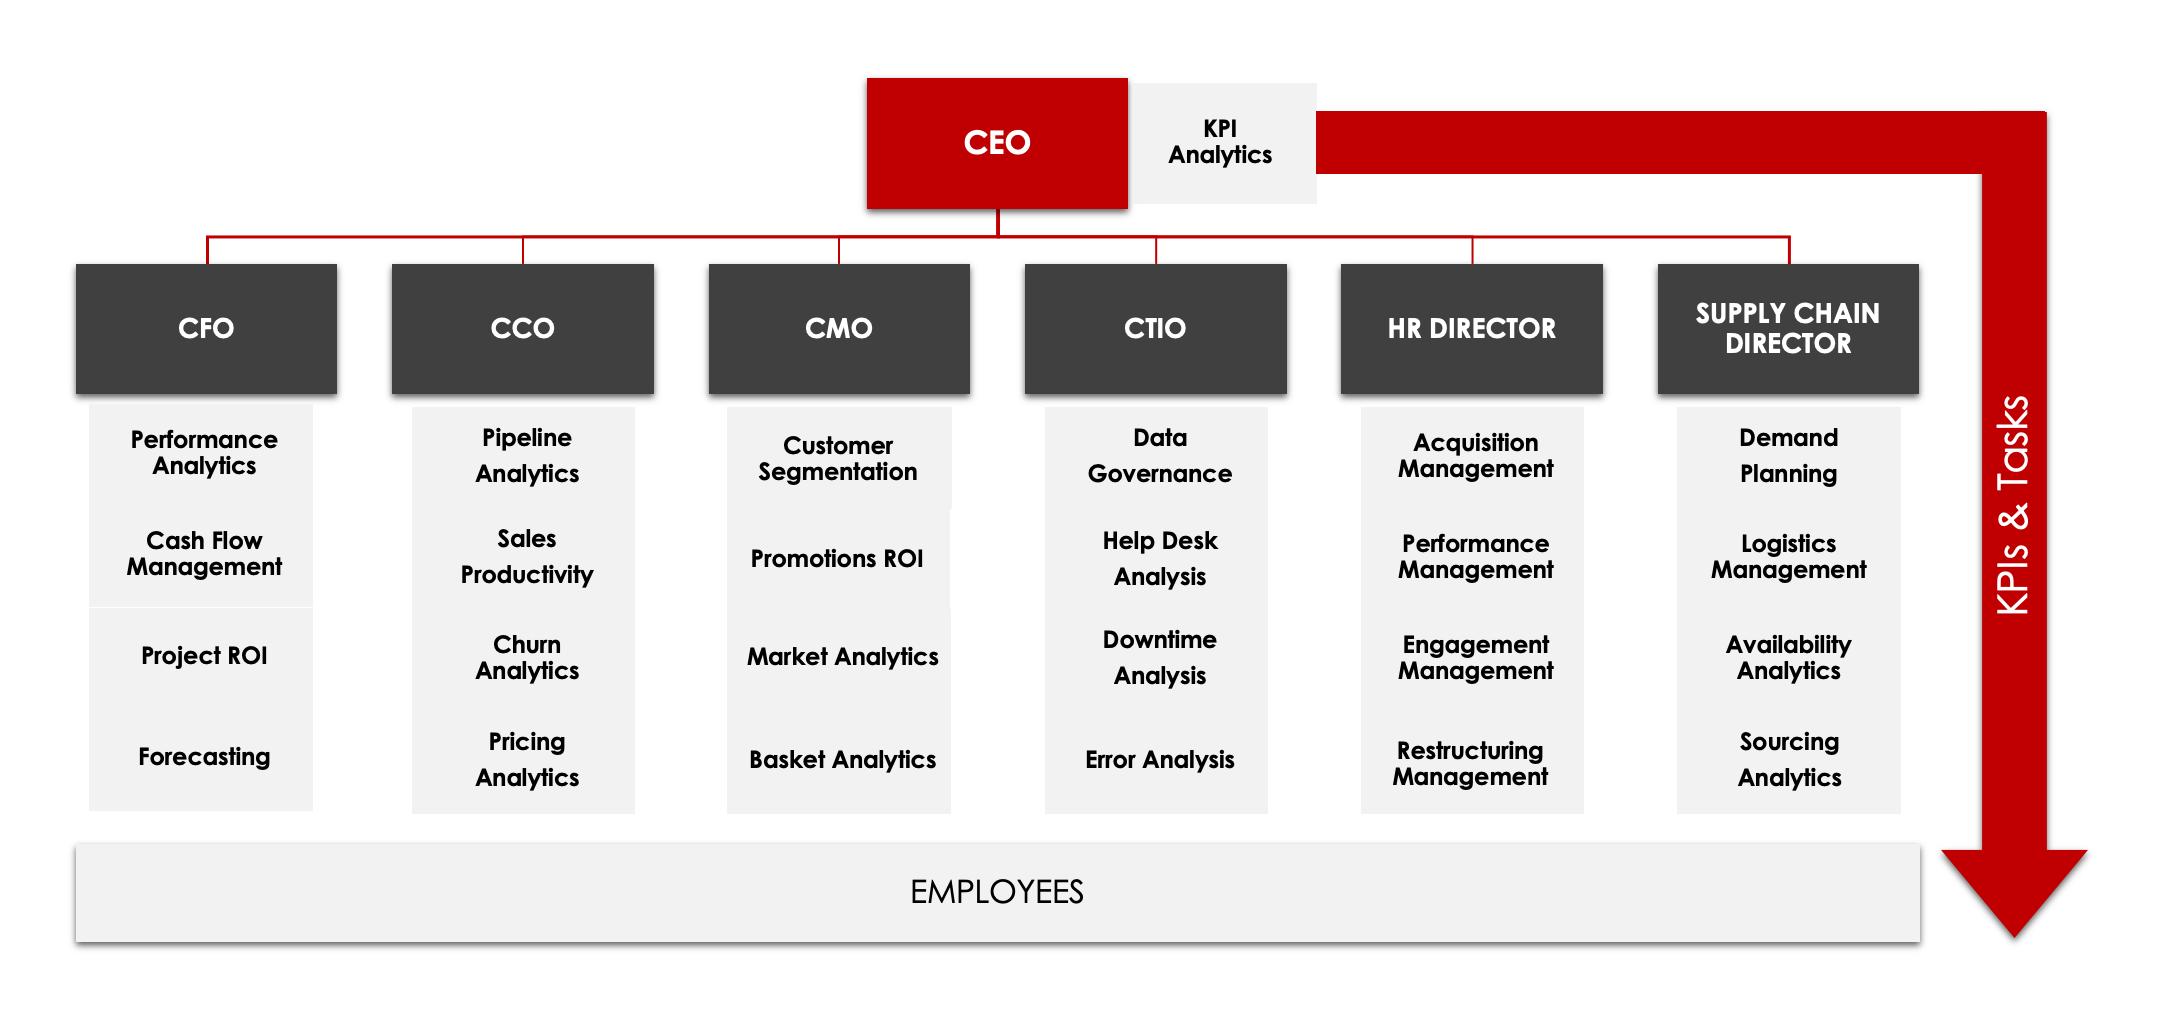 Cascade KPIs Through Your Organisation